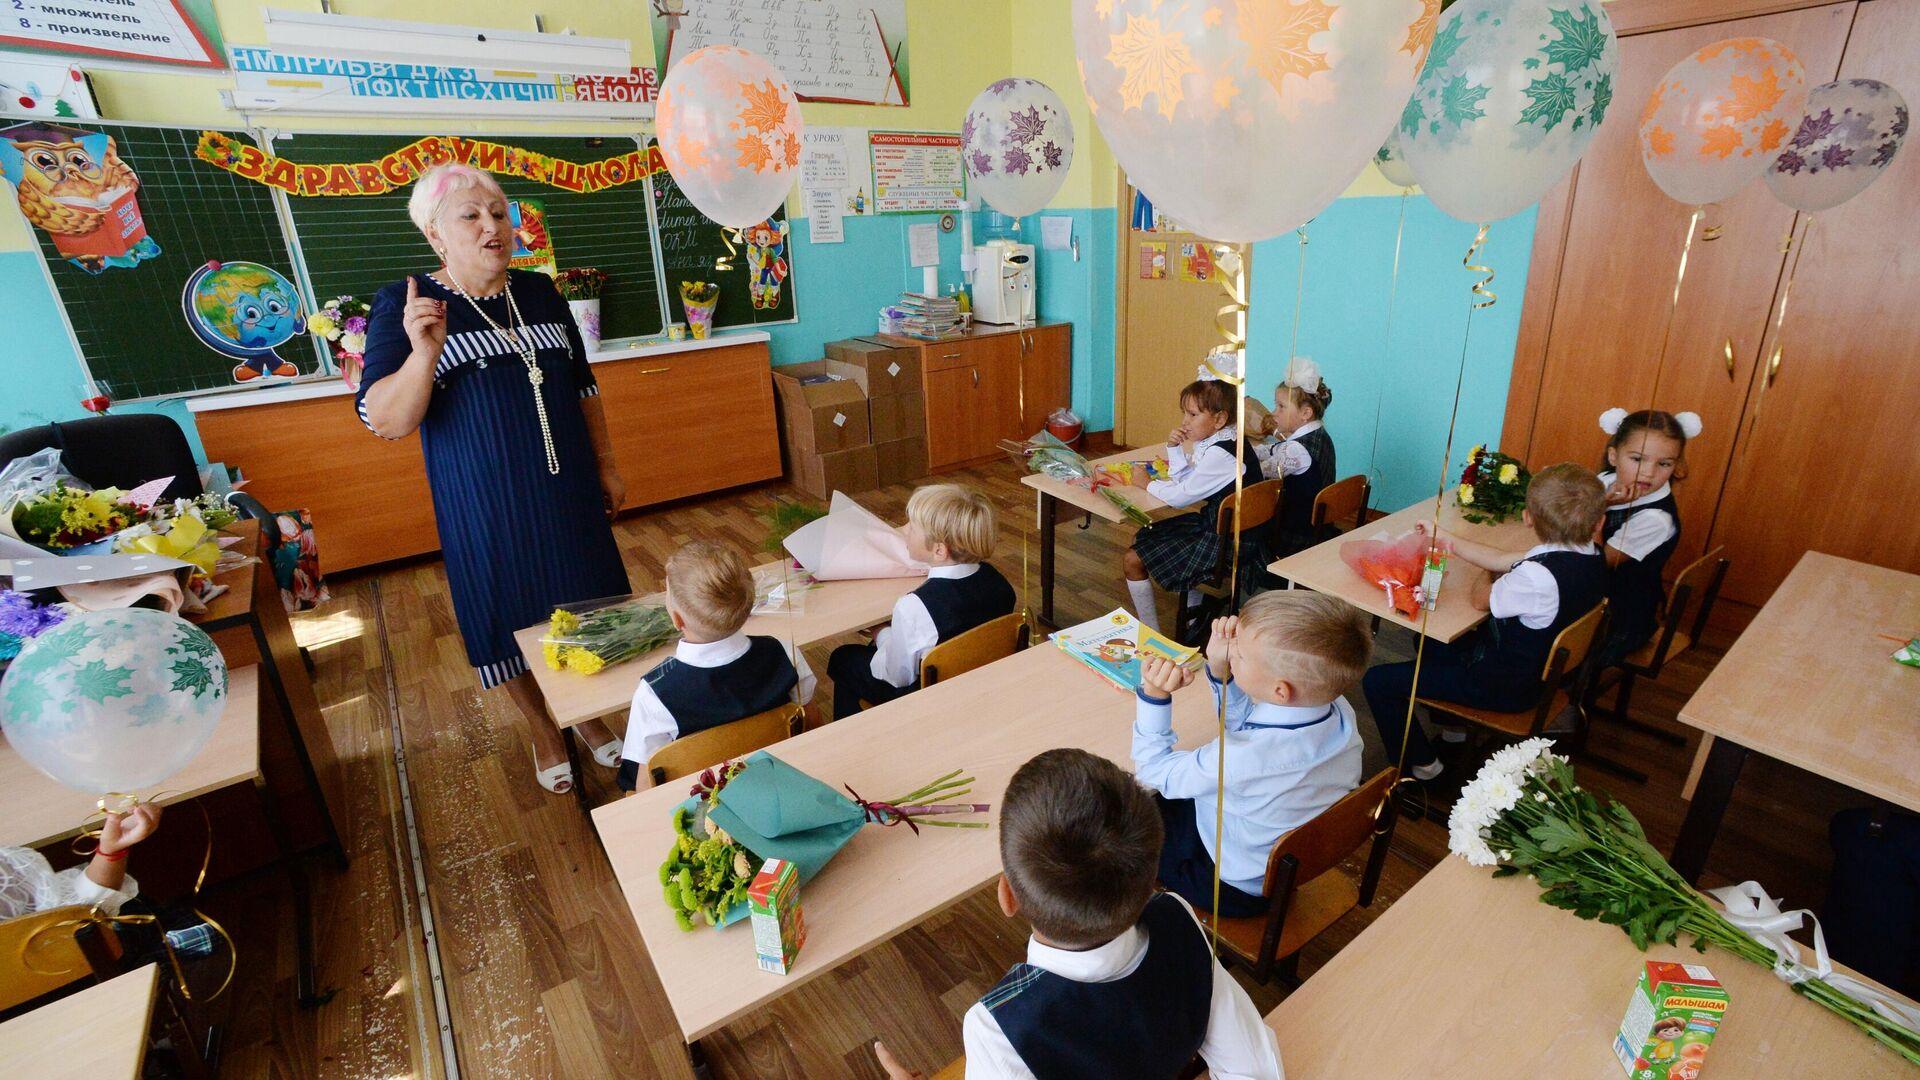 Ученики в школе - РИА Новости, 1920, 15.09.2021